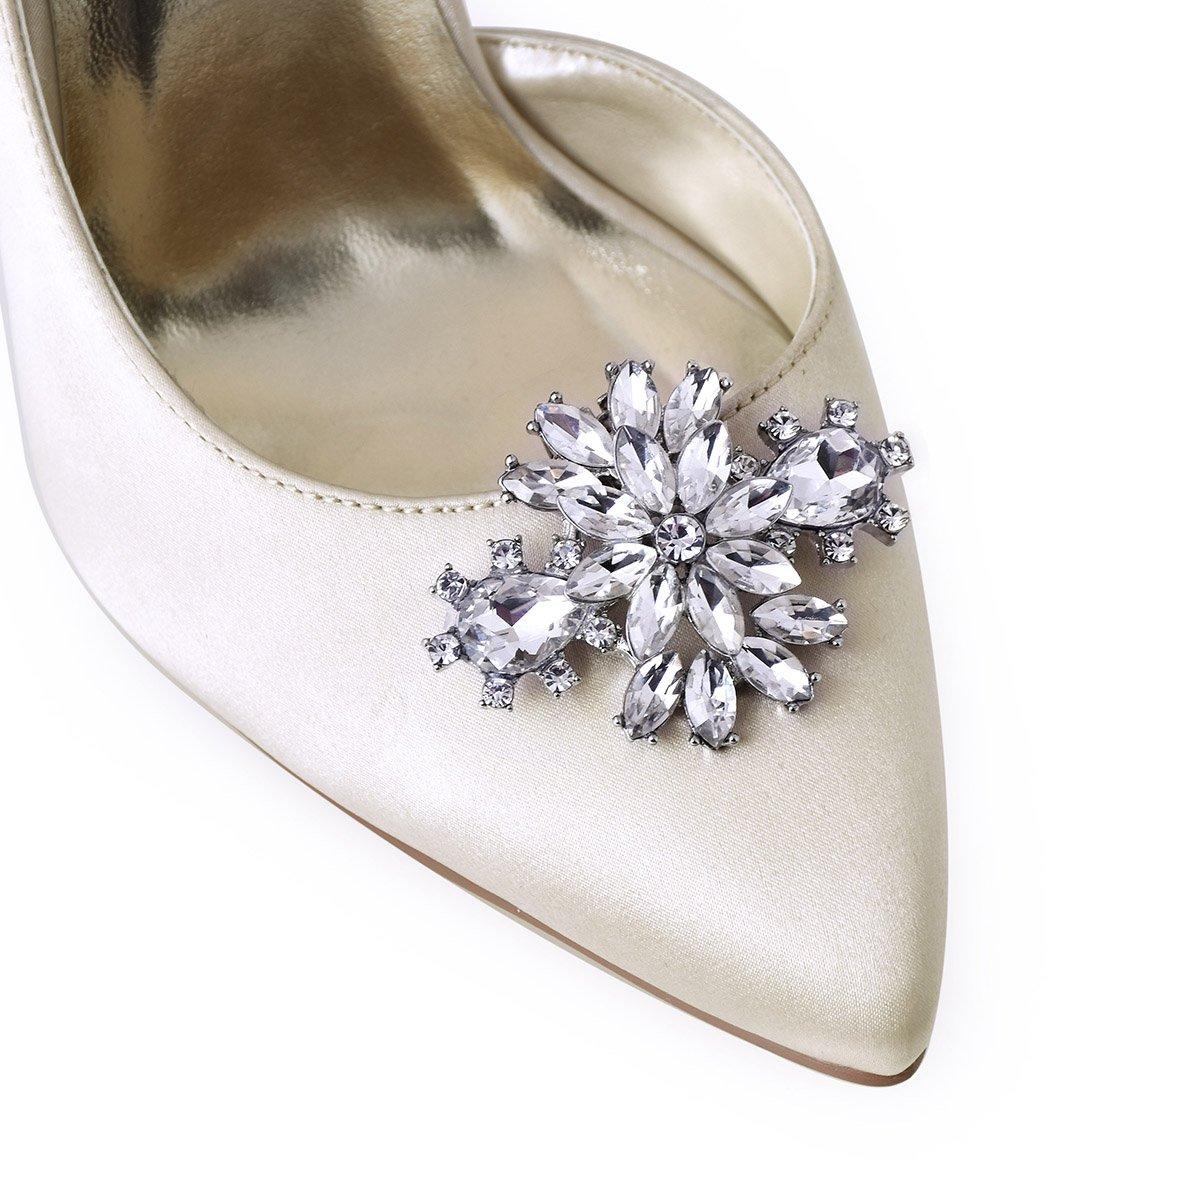 ElegantPark AK Wedding Dress Clutch Double Rhinestones Flowers Silver Shoe Clips 2 Pcs by ElegantPark (Image #2)